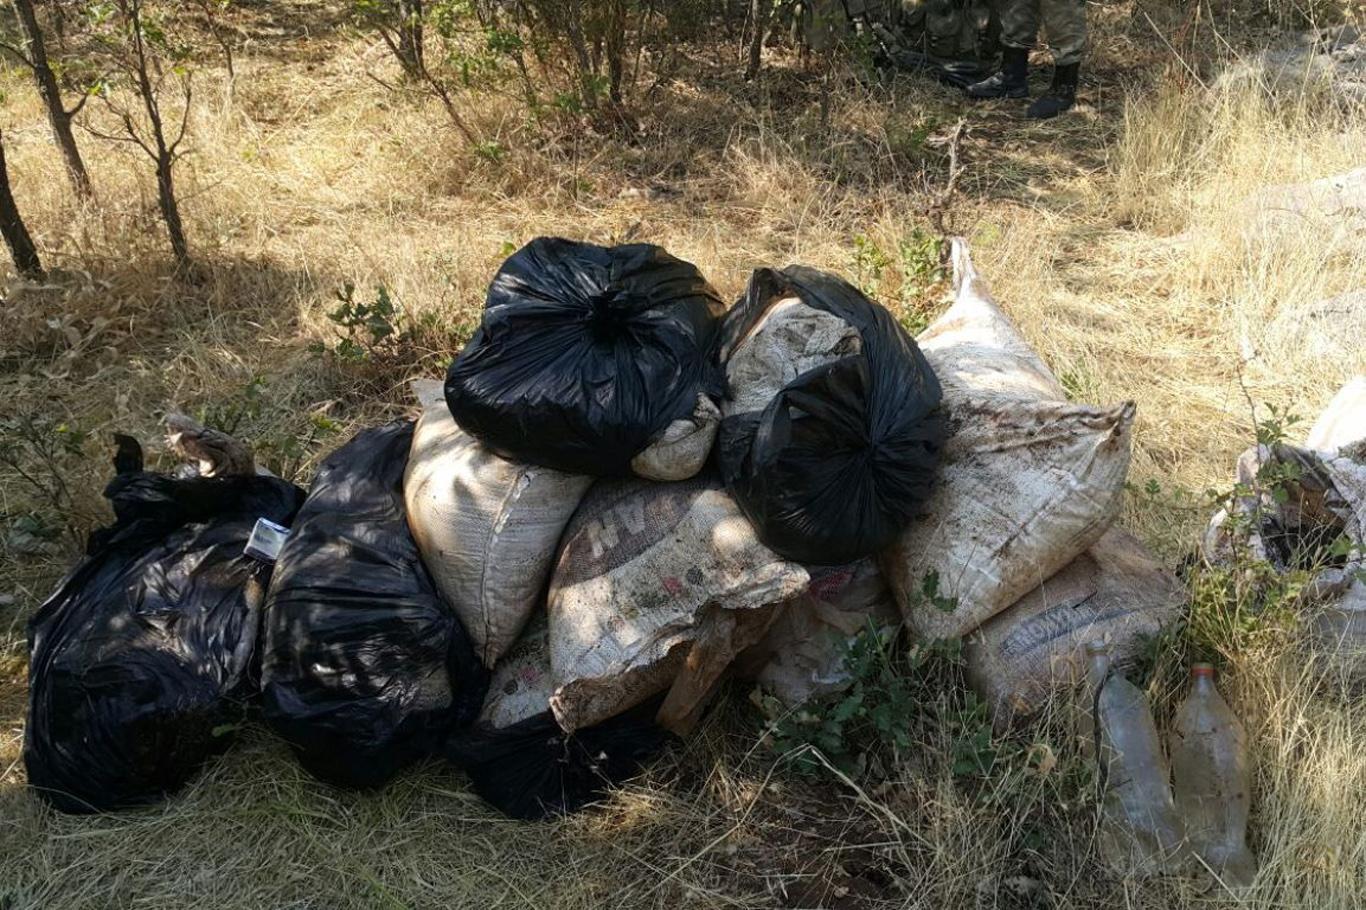 Lice'de sığınakta 500 kg amonyum nitrat ele geçirildi